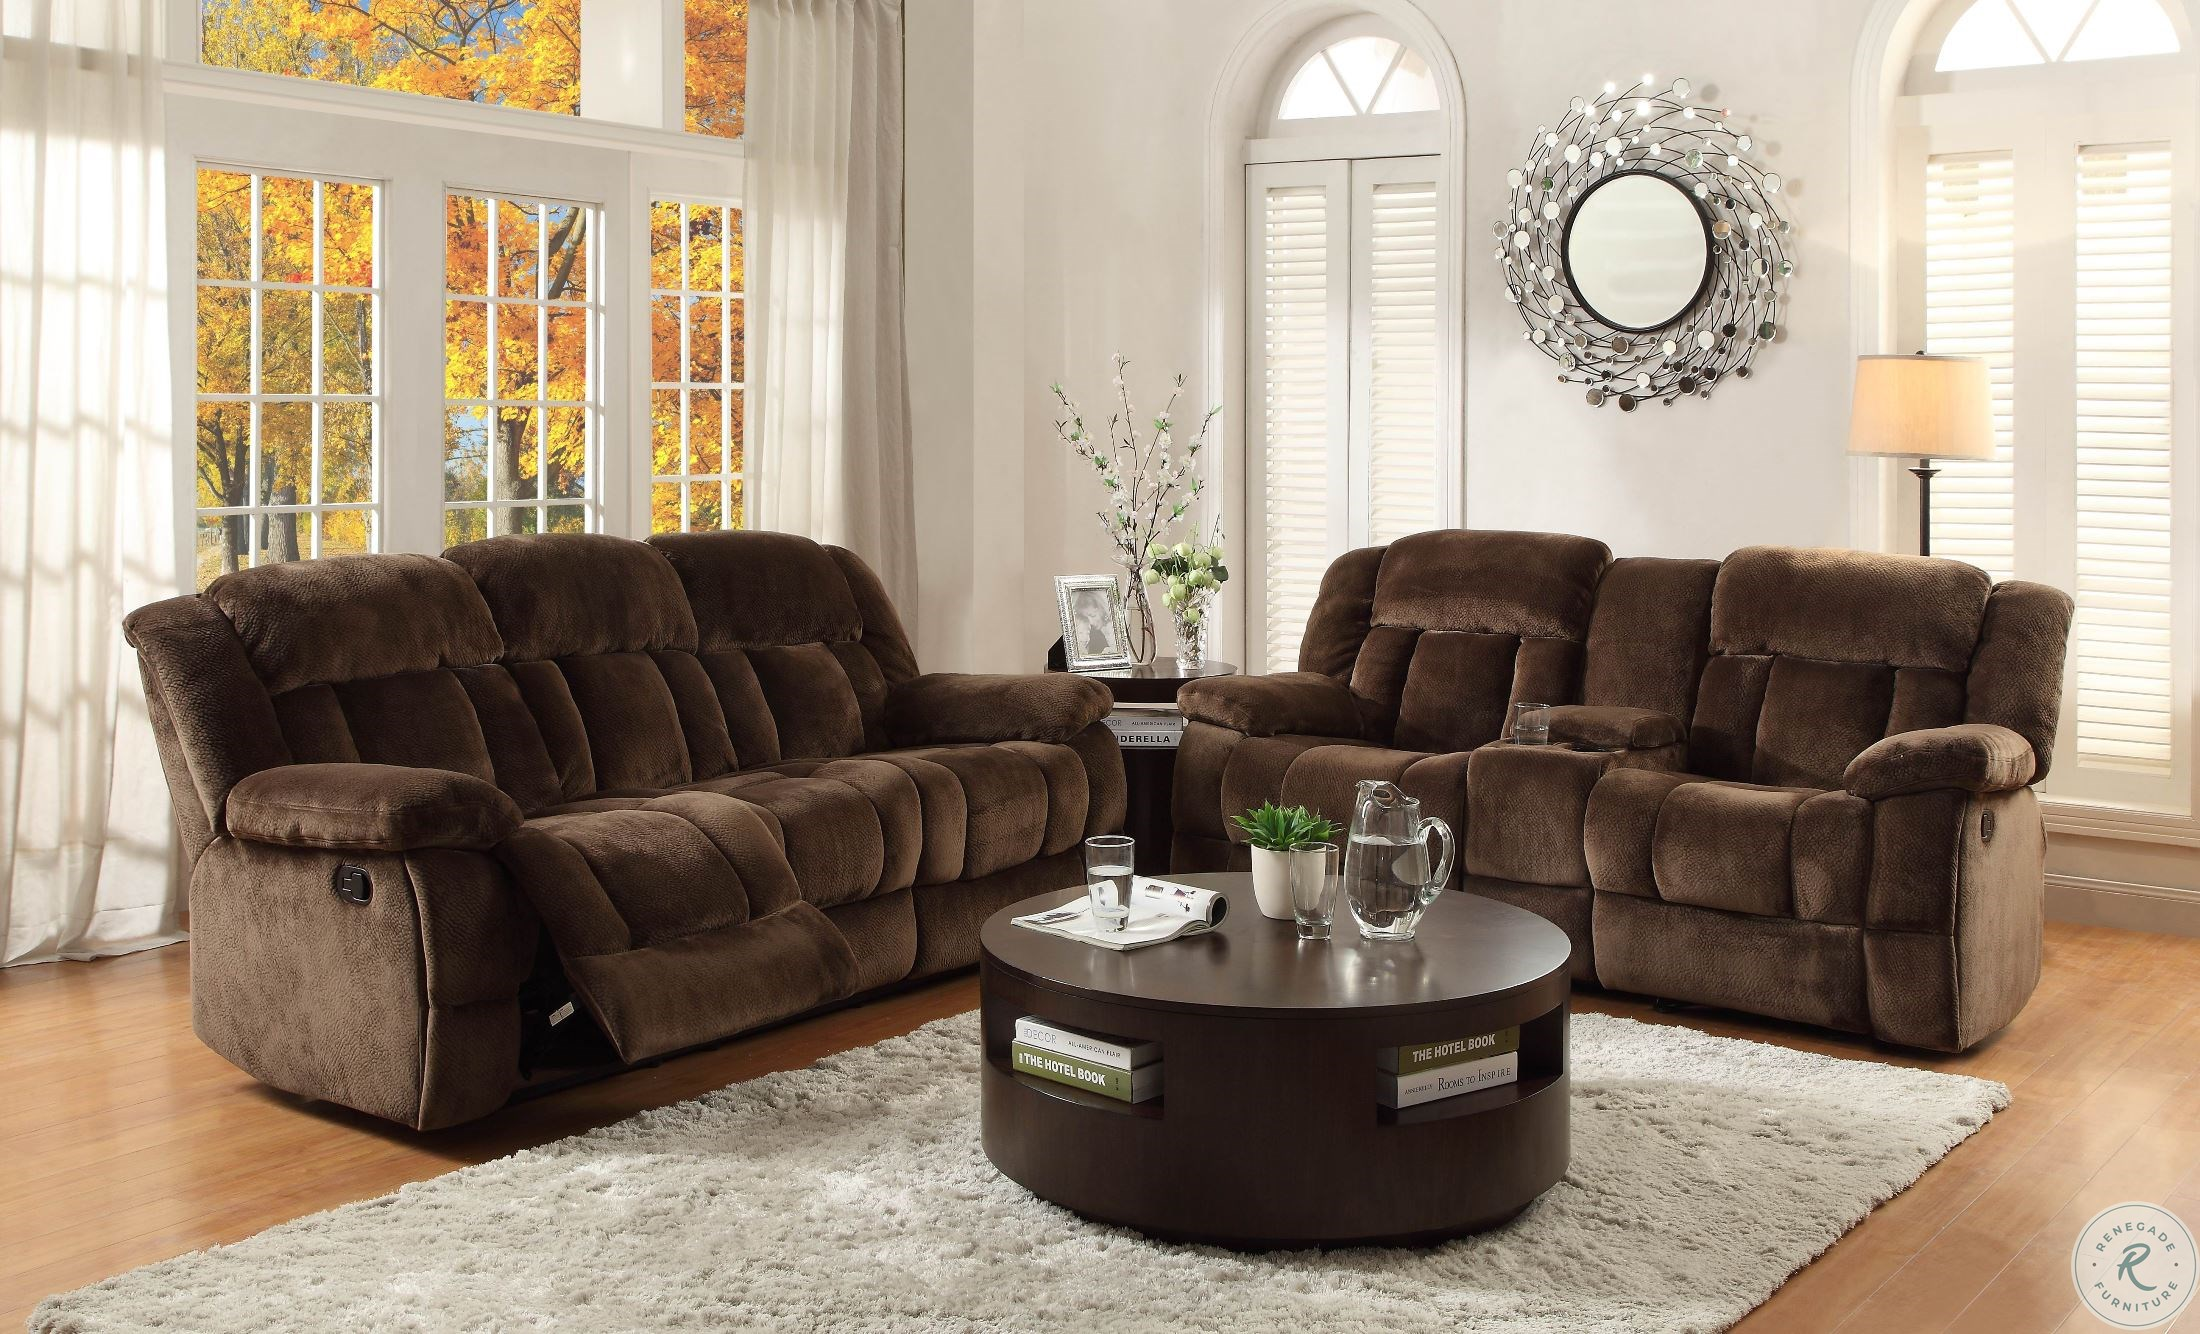 Miraculous Laurelton Chocolate Double Glider Reclining Loveseat With Console Uwap Interior Chair Design Uwaporg